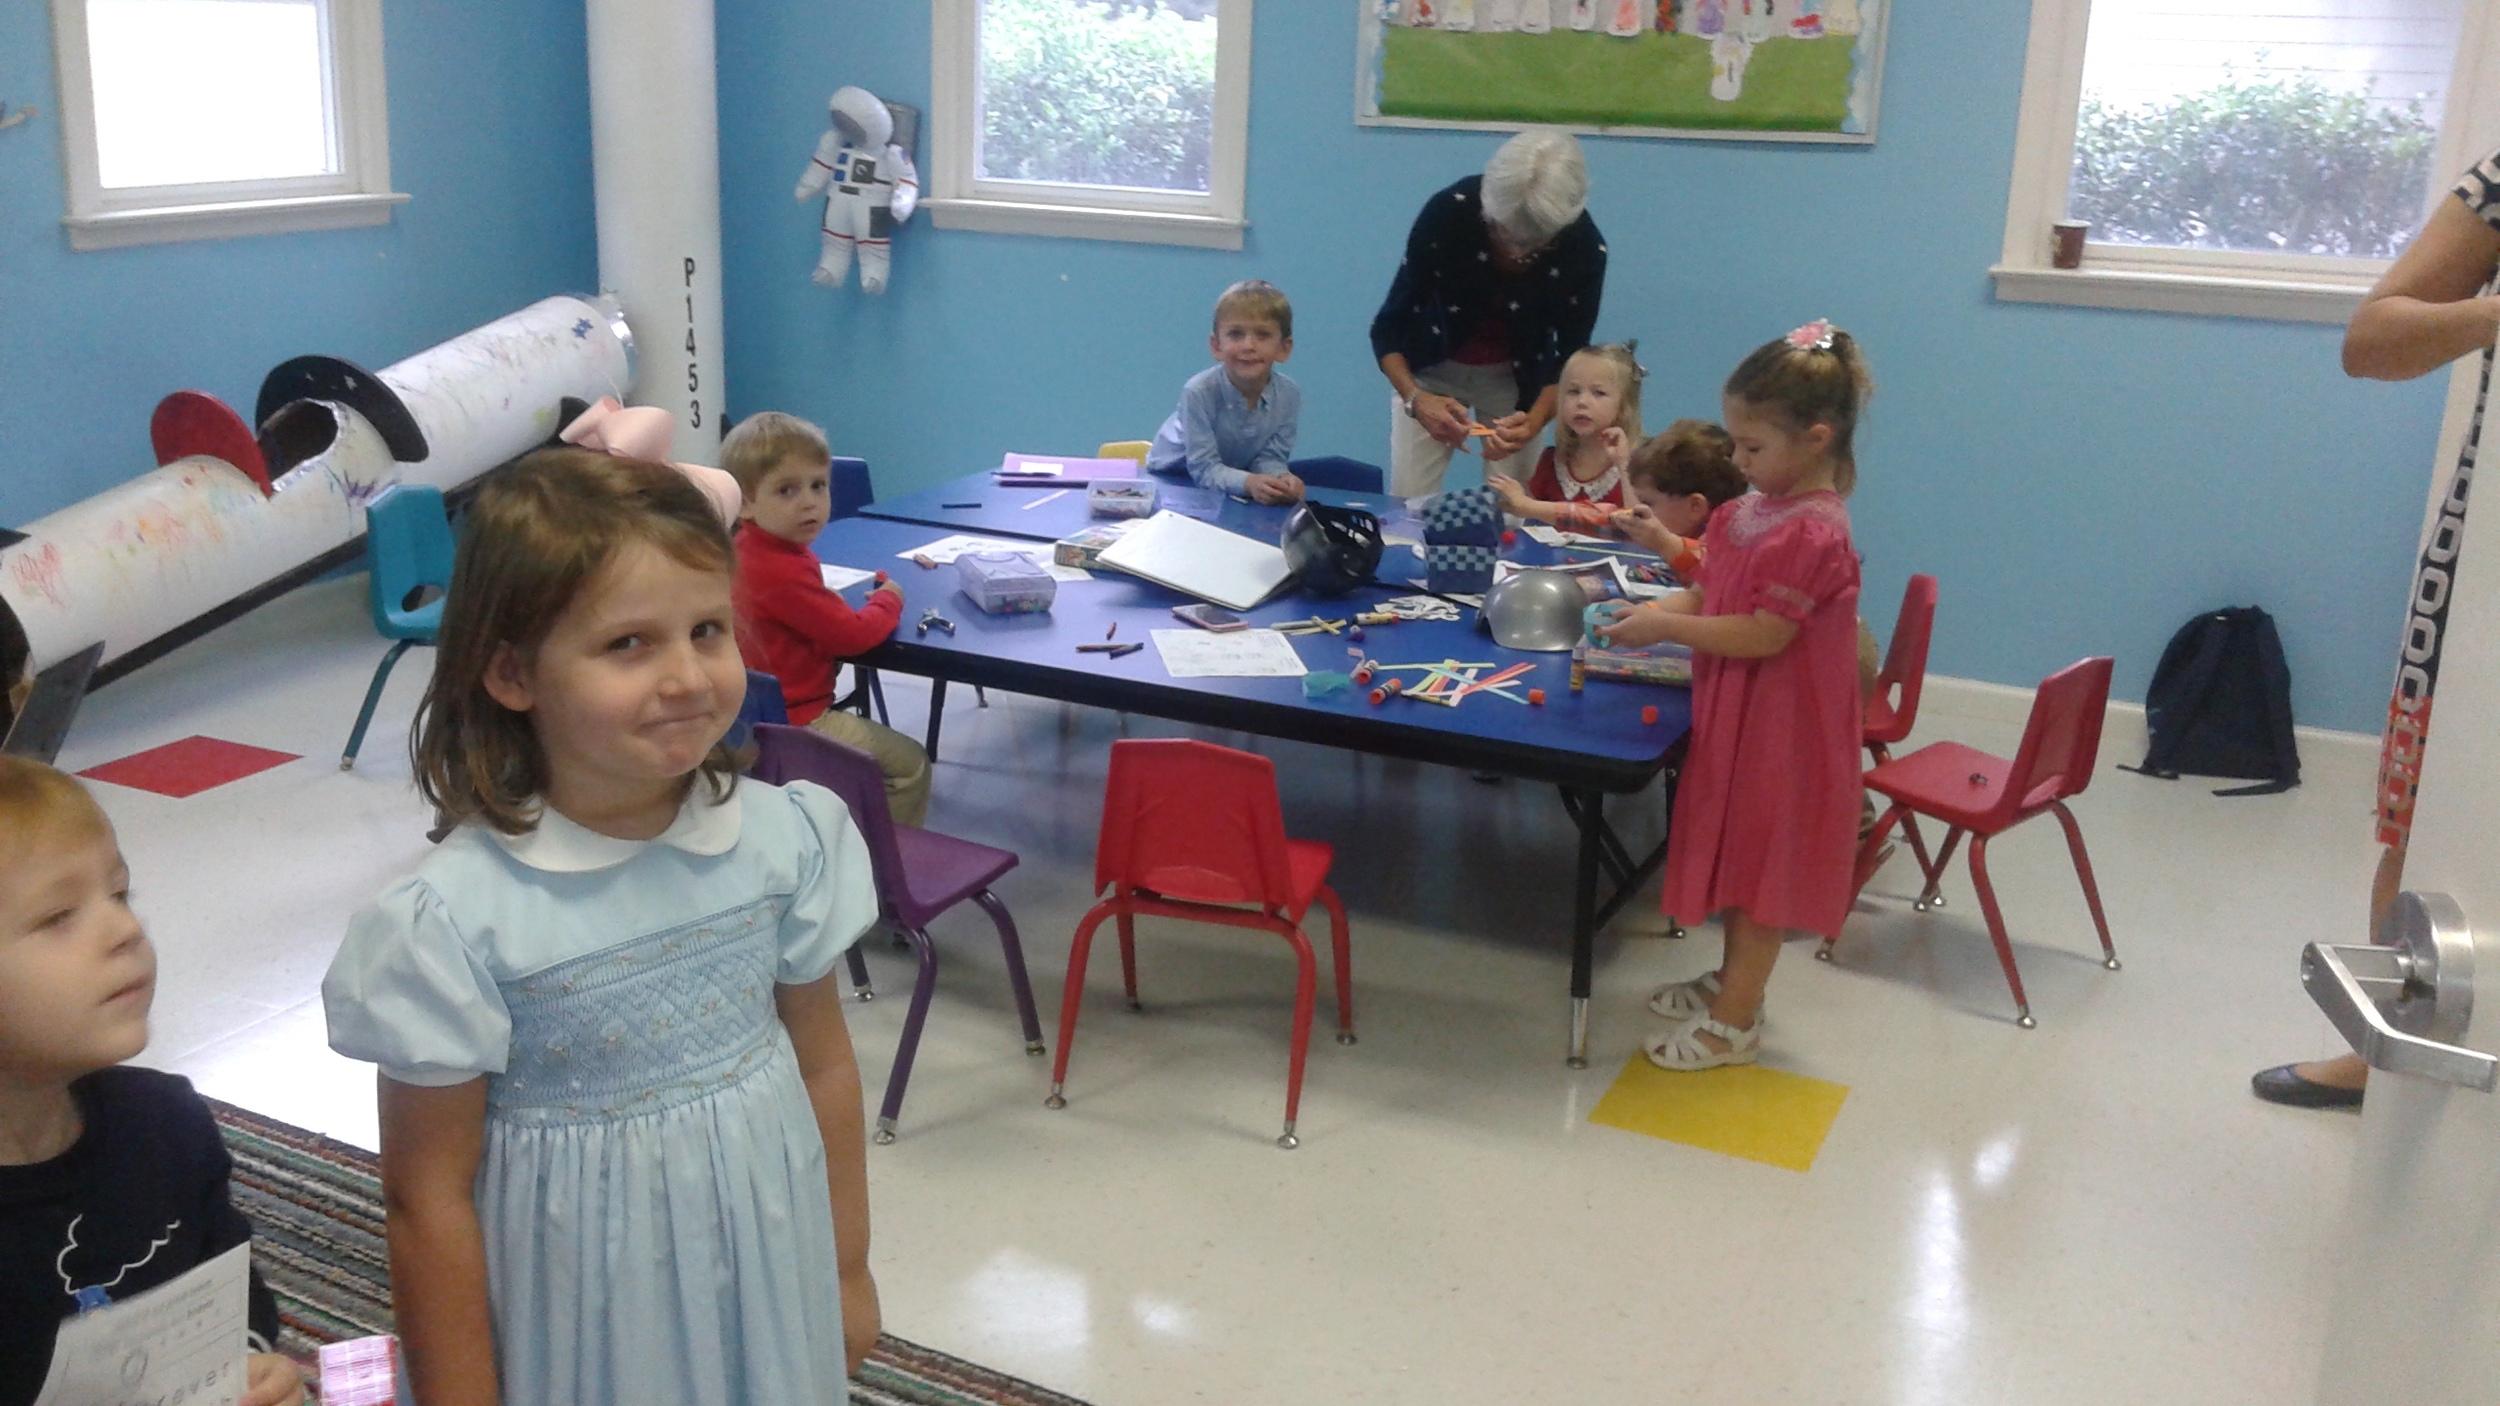 The Preschool class had fun making anchors.